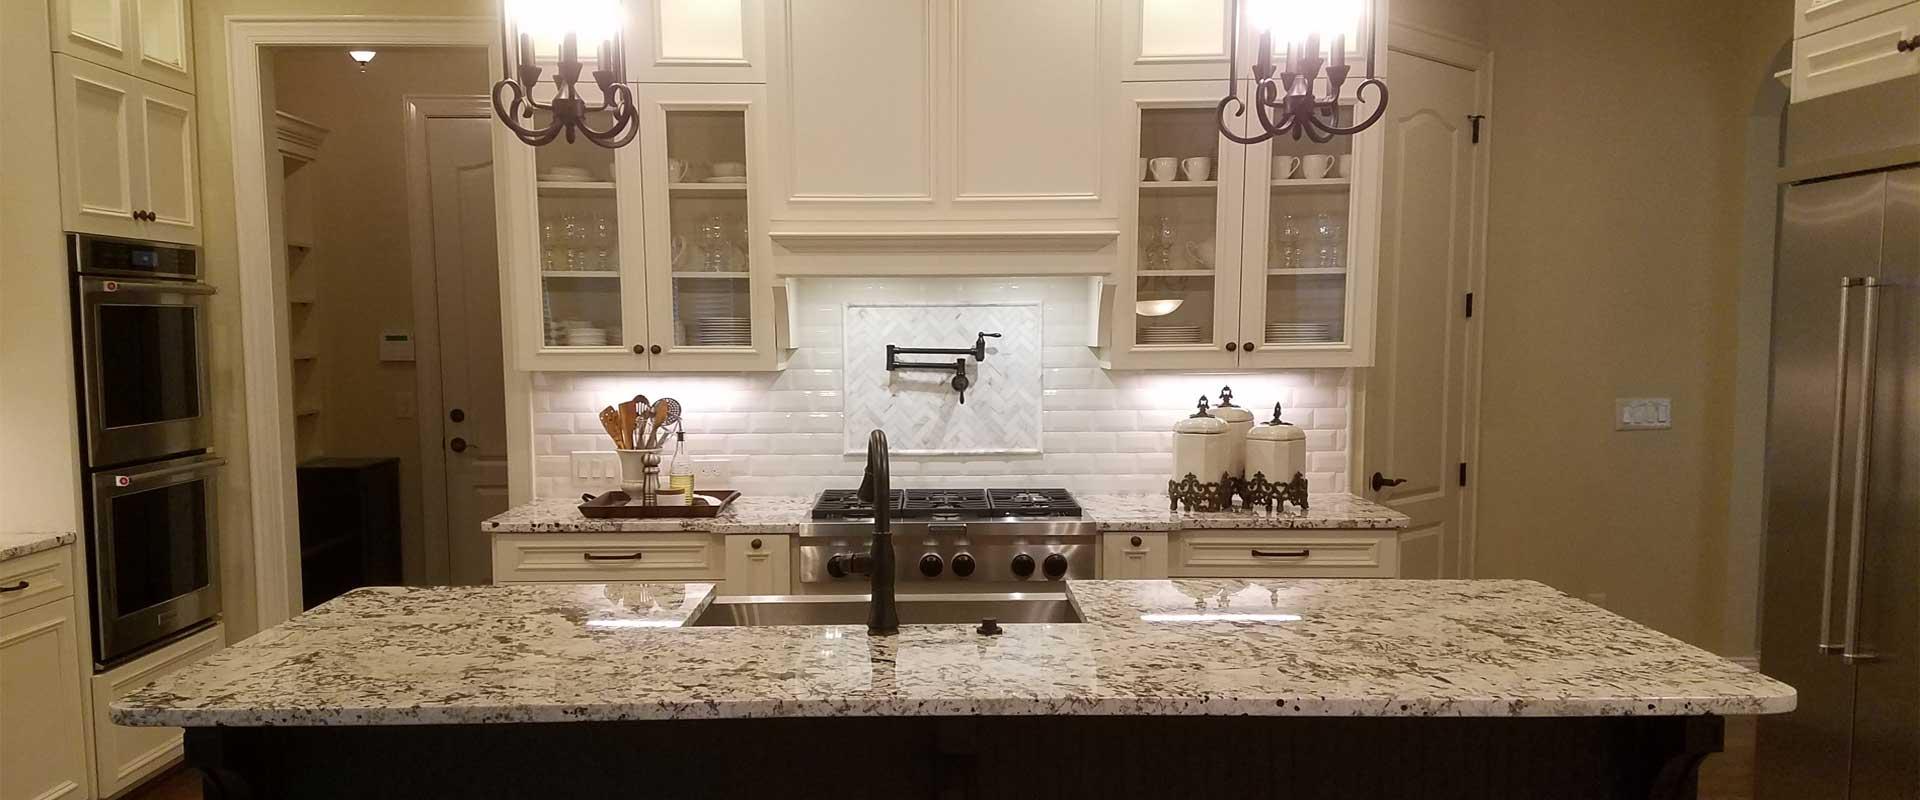 Cabinets Bathroom Remodeling Kitchen Remodeling Matthews Huntersville Indian Trail Charlotte Nc